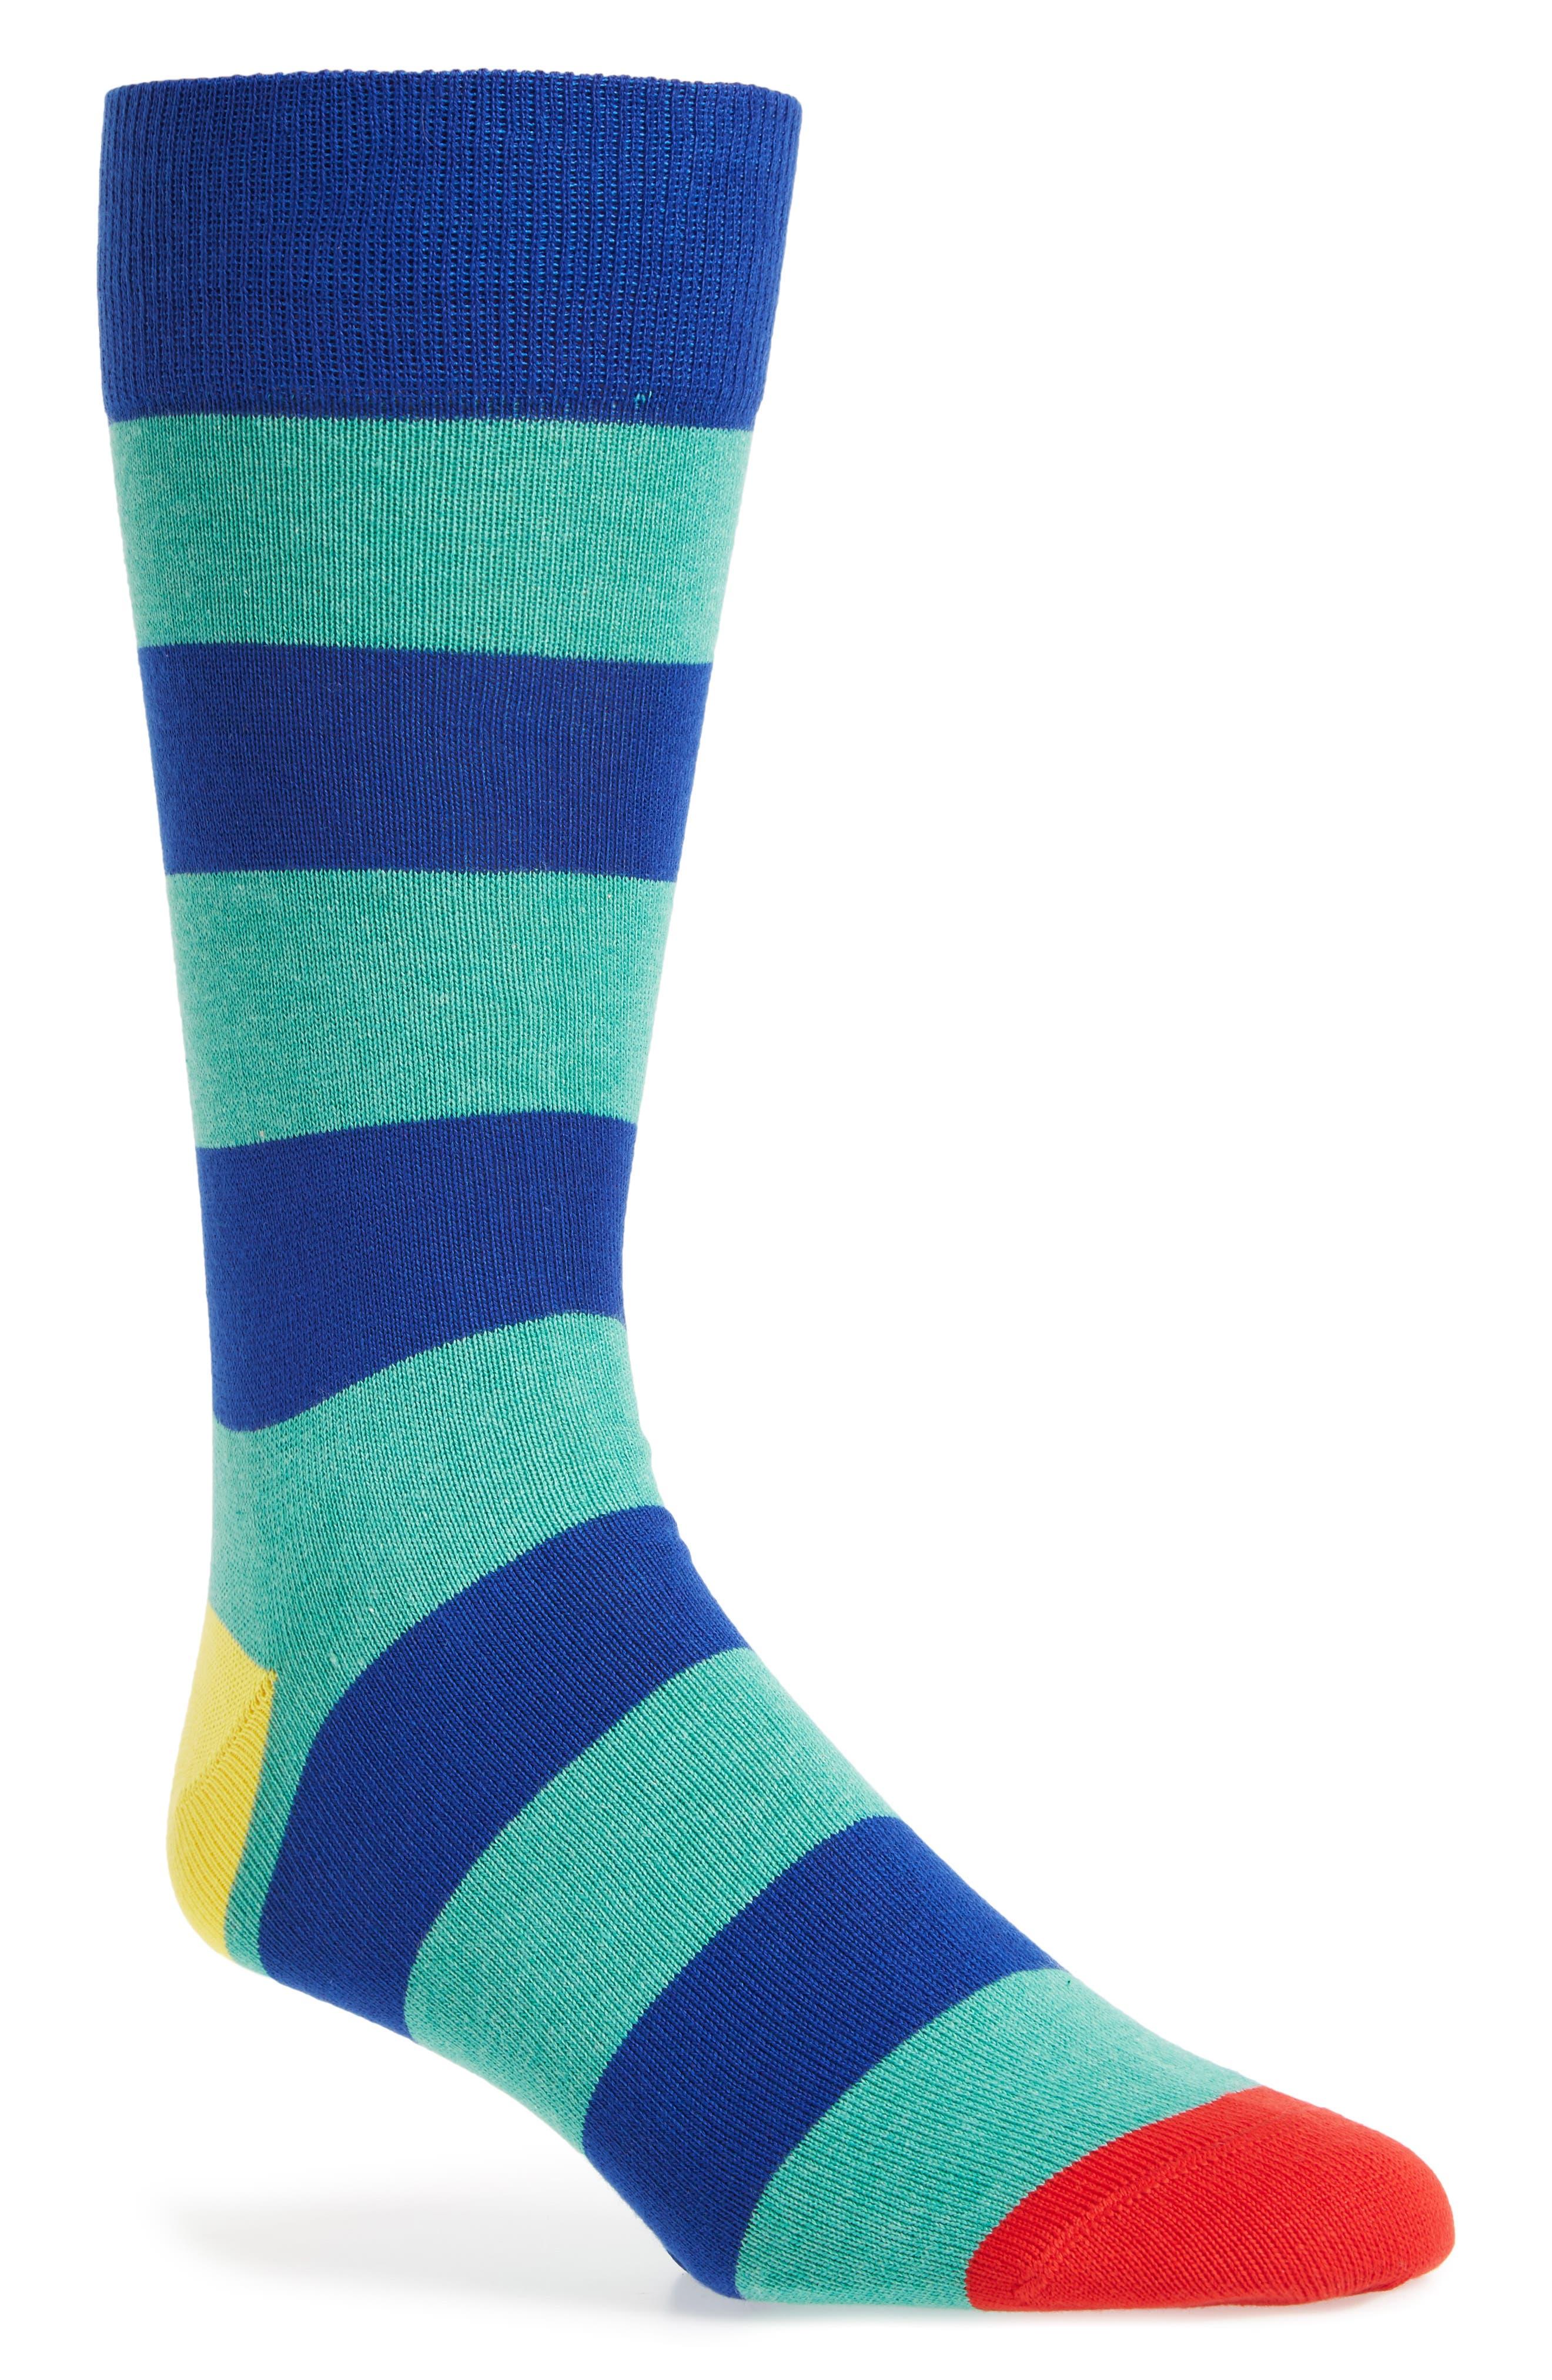 Stripe Socks,                             Main thumbnail 1, color,                             Green/ Blue